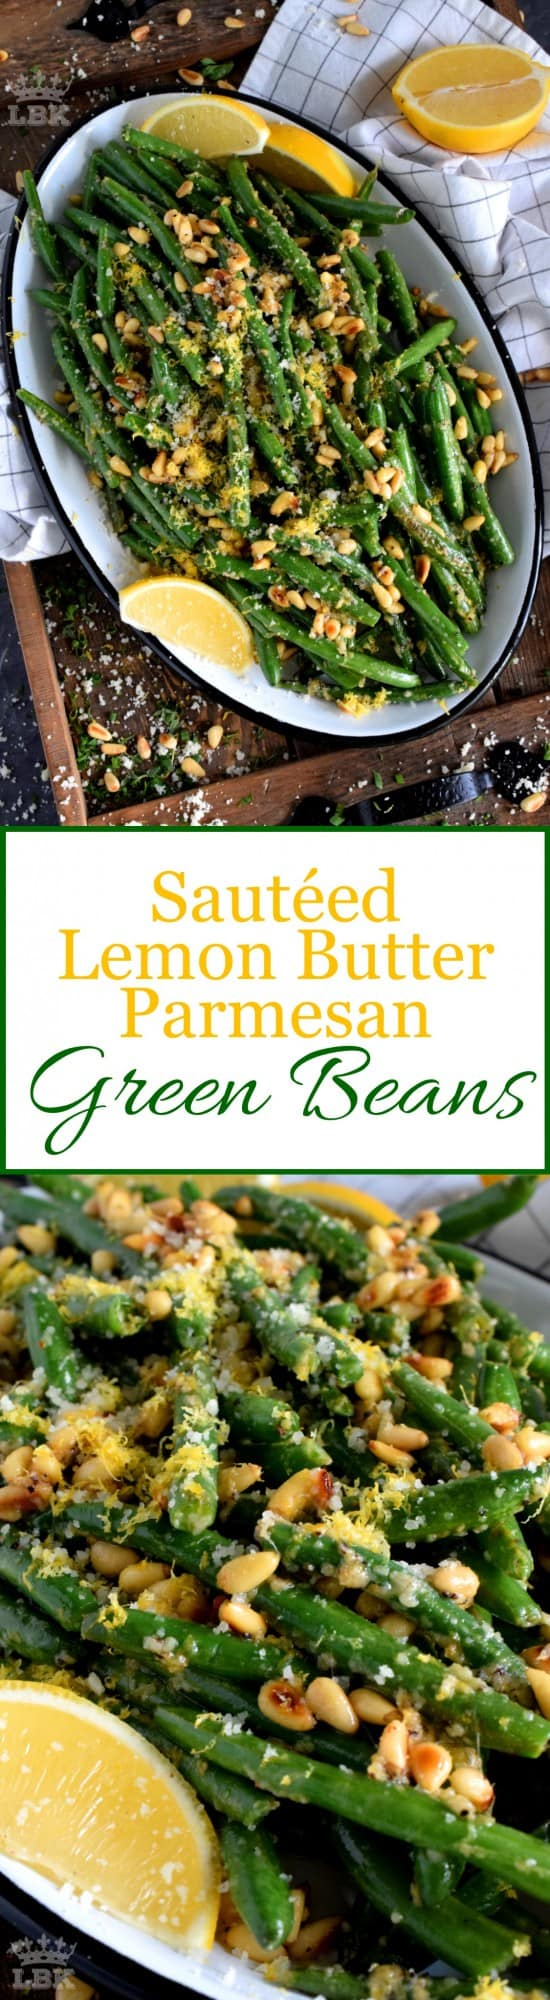 Sauteed Lemon Butter Parmesan Green Beans